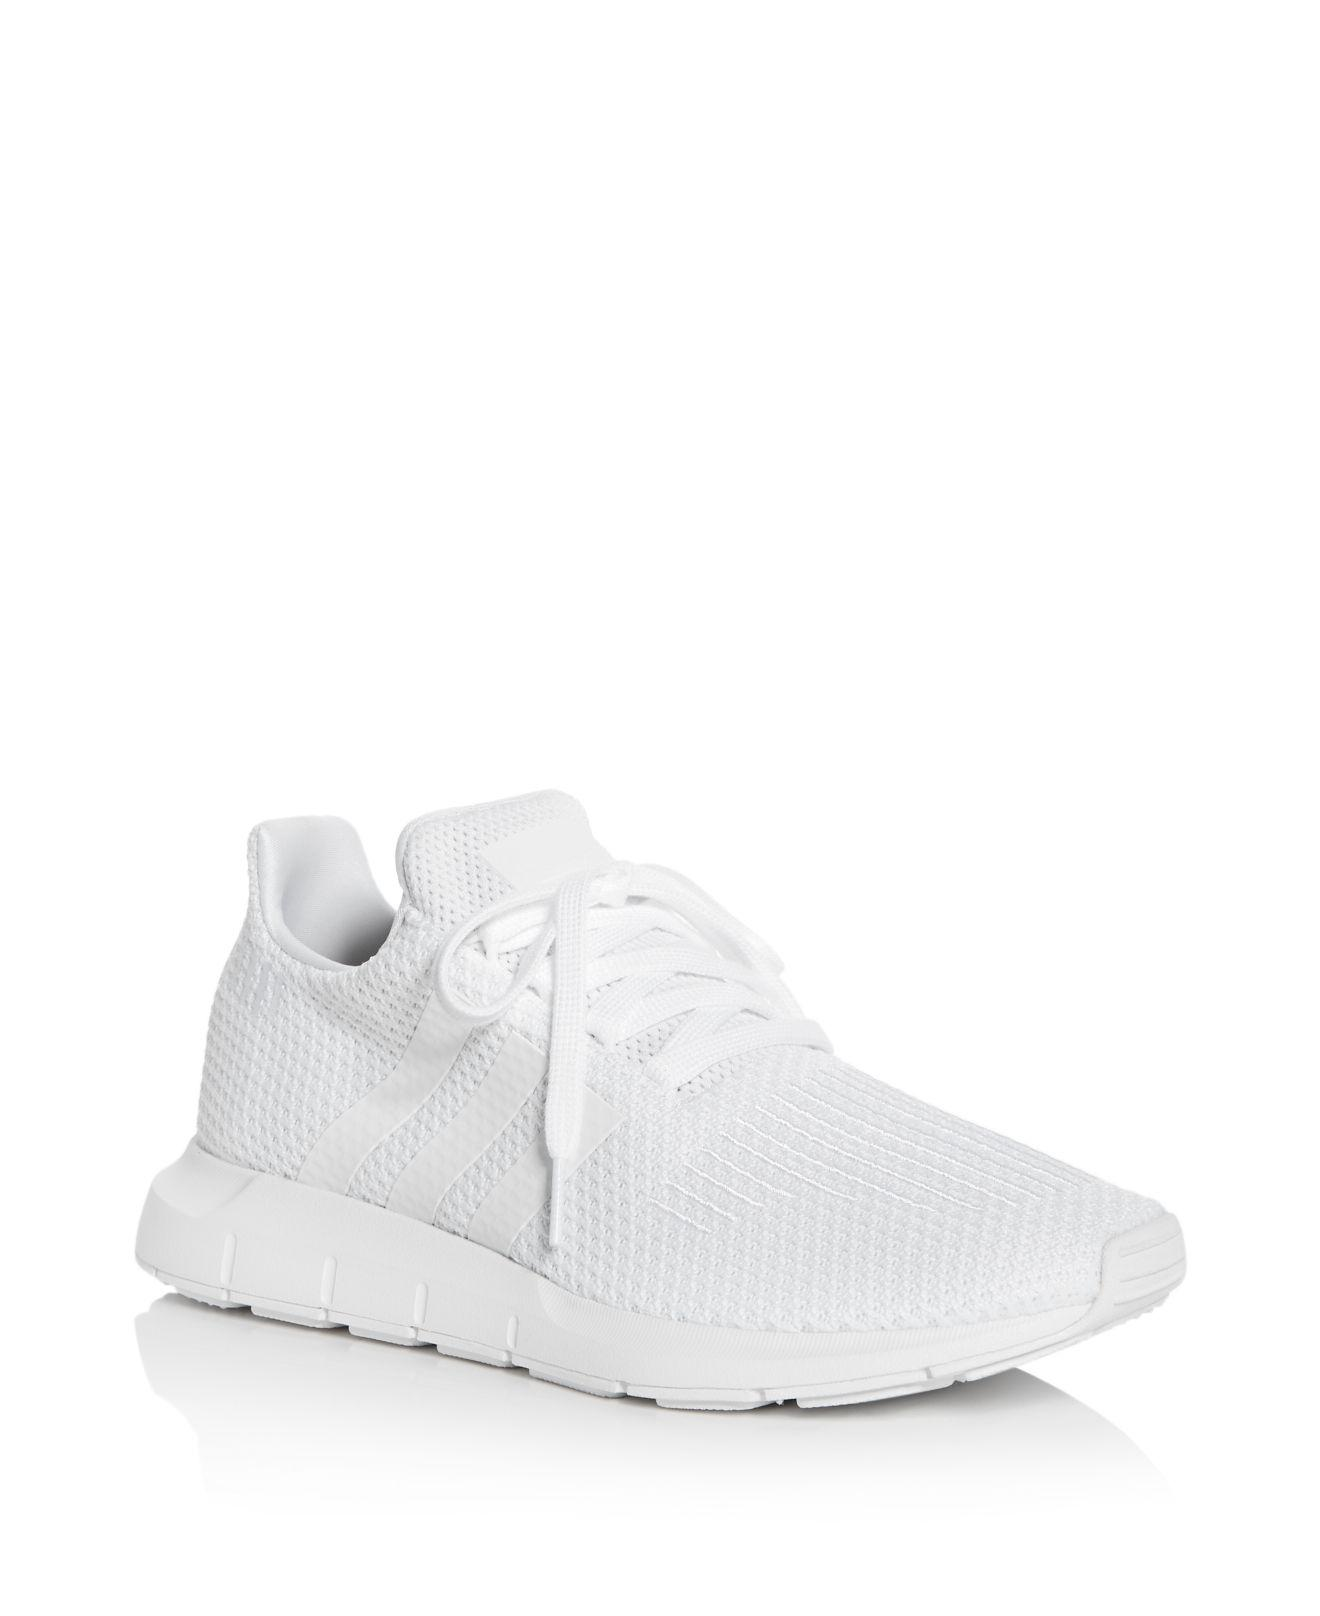 Adidas Donne A Swift Run Allacciarsi Le Scarpe Da Ginnastica In Bianco Lyst